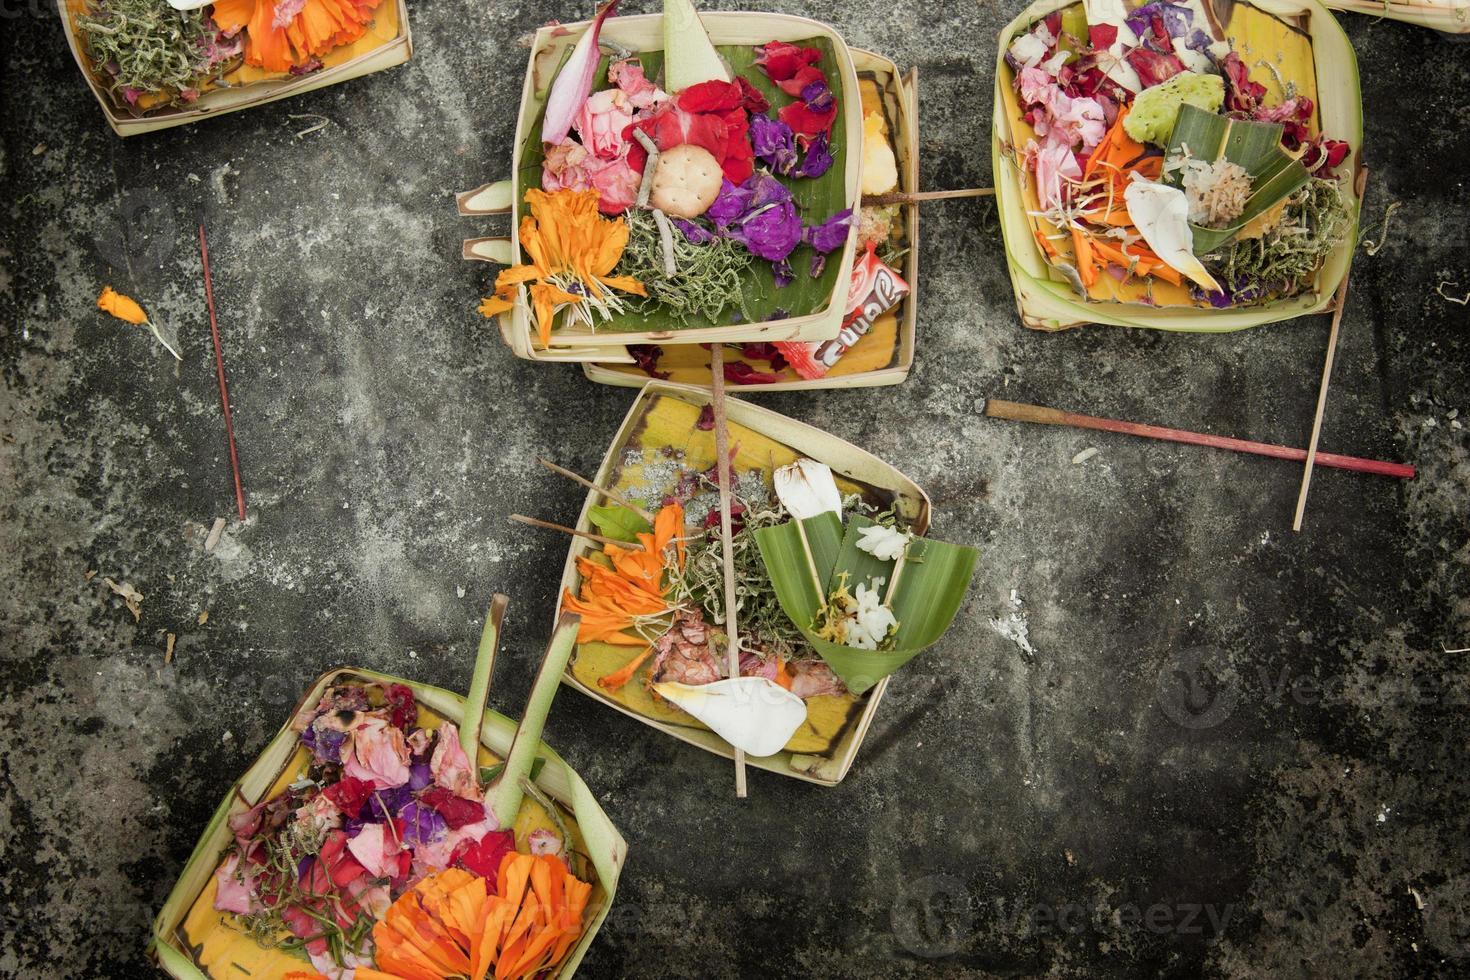 canang, un'offerta balinese agli dei foto